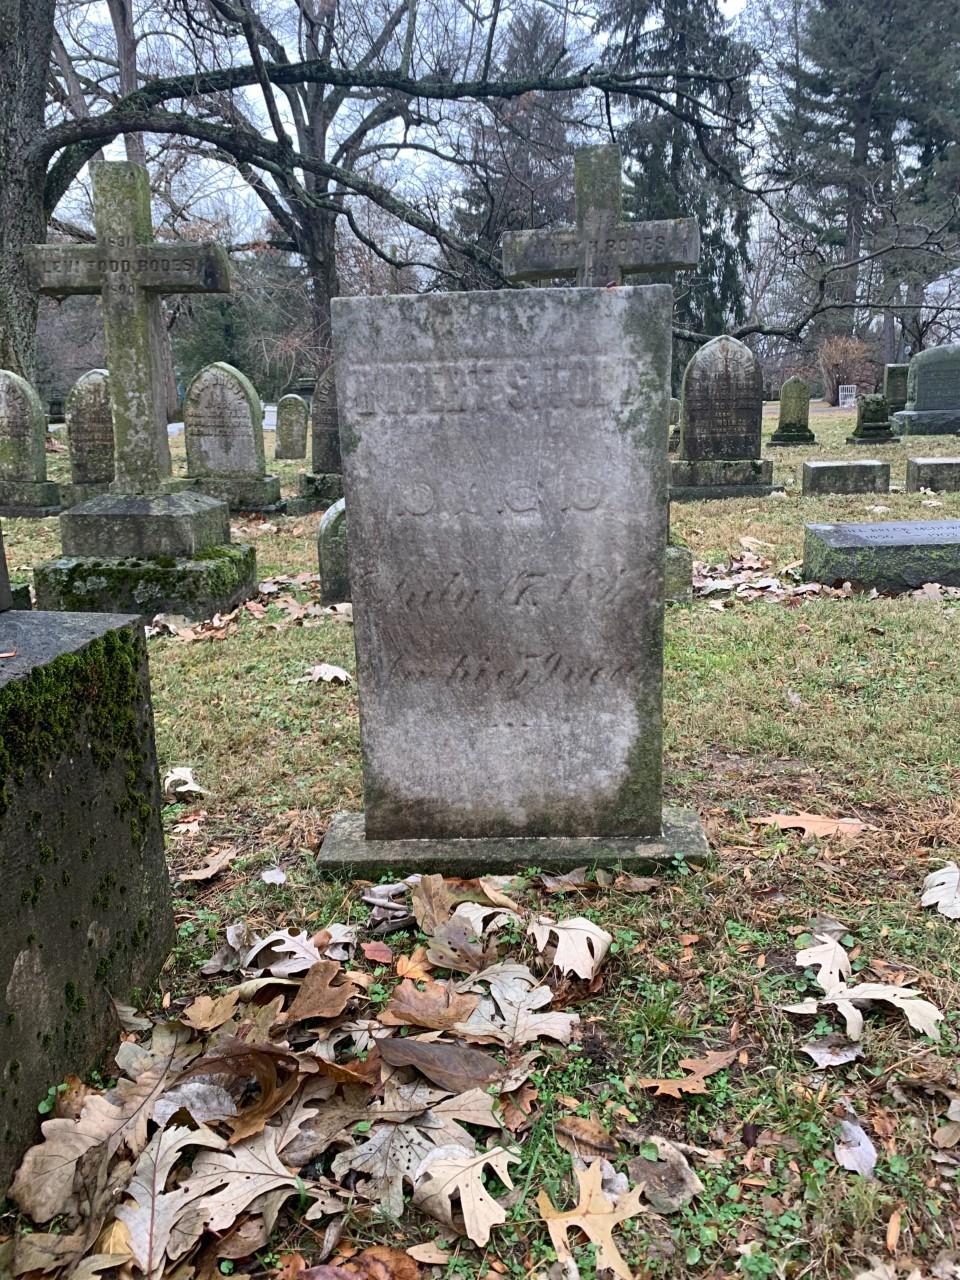 Robert Smith Todd's tombstone in the Lexington Cemetery.